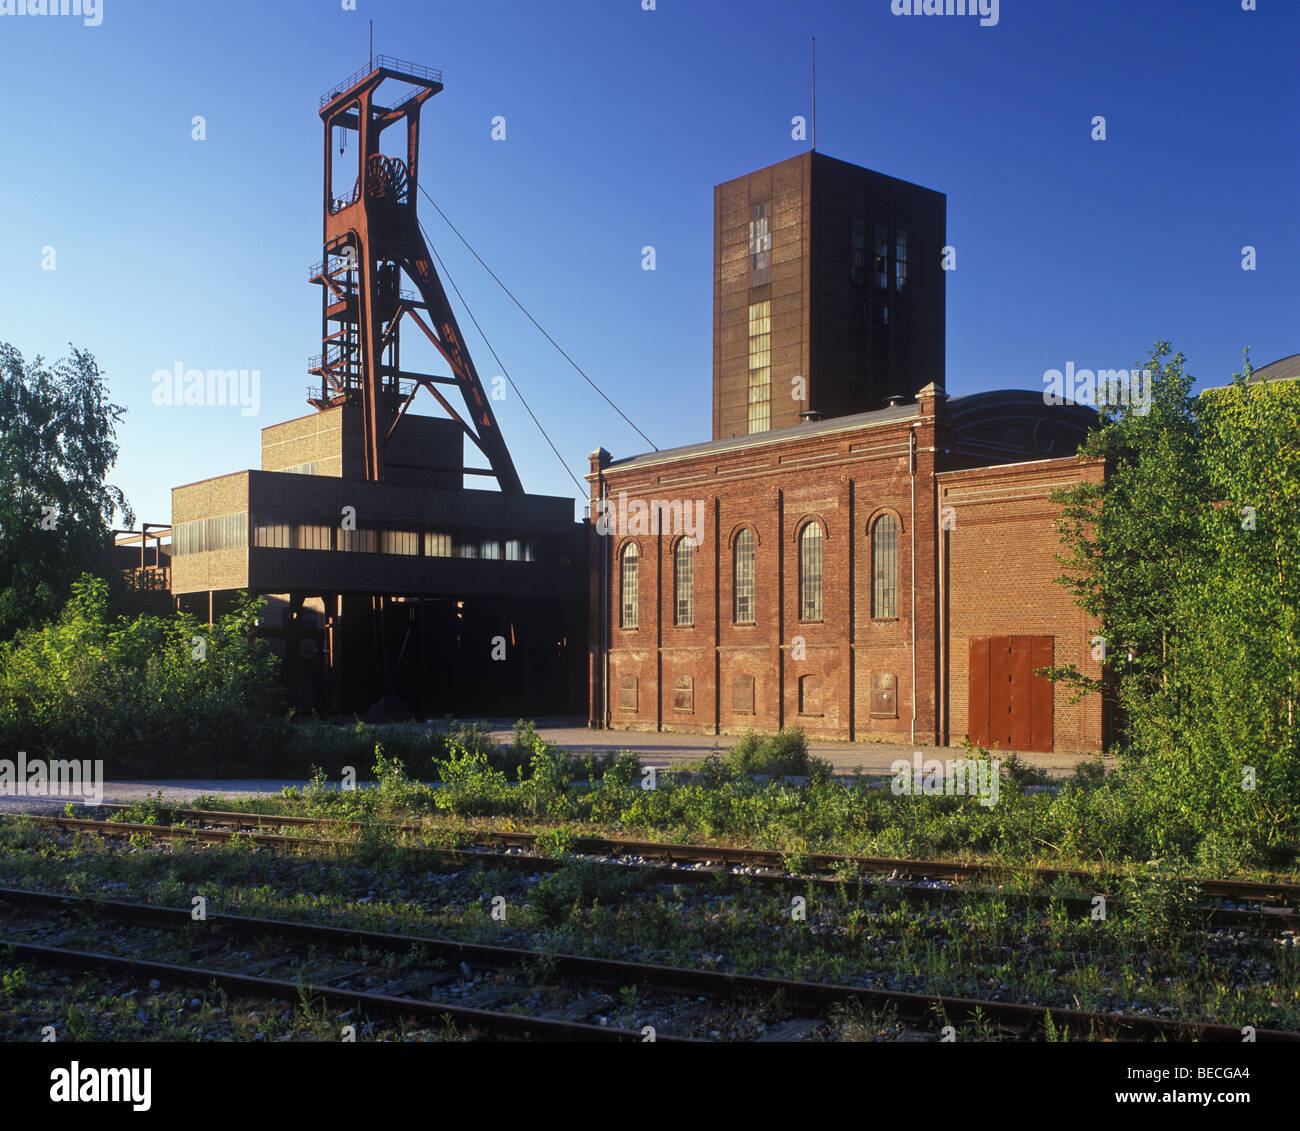 Zollverein Coal Mine Industrial Complex, Essen, North Rhine-Westphalia, Germany, Europe - Stock Image